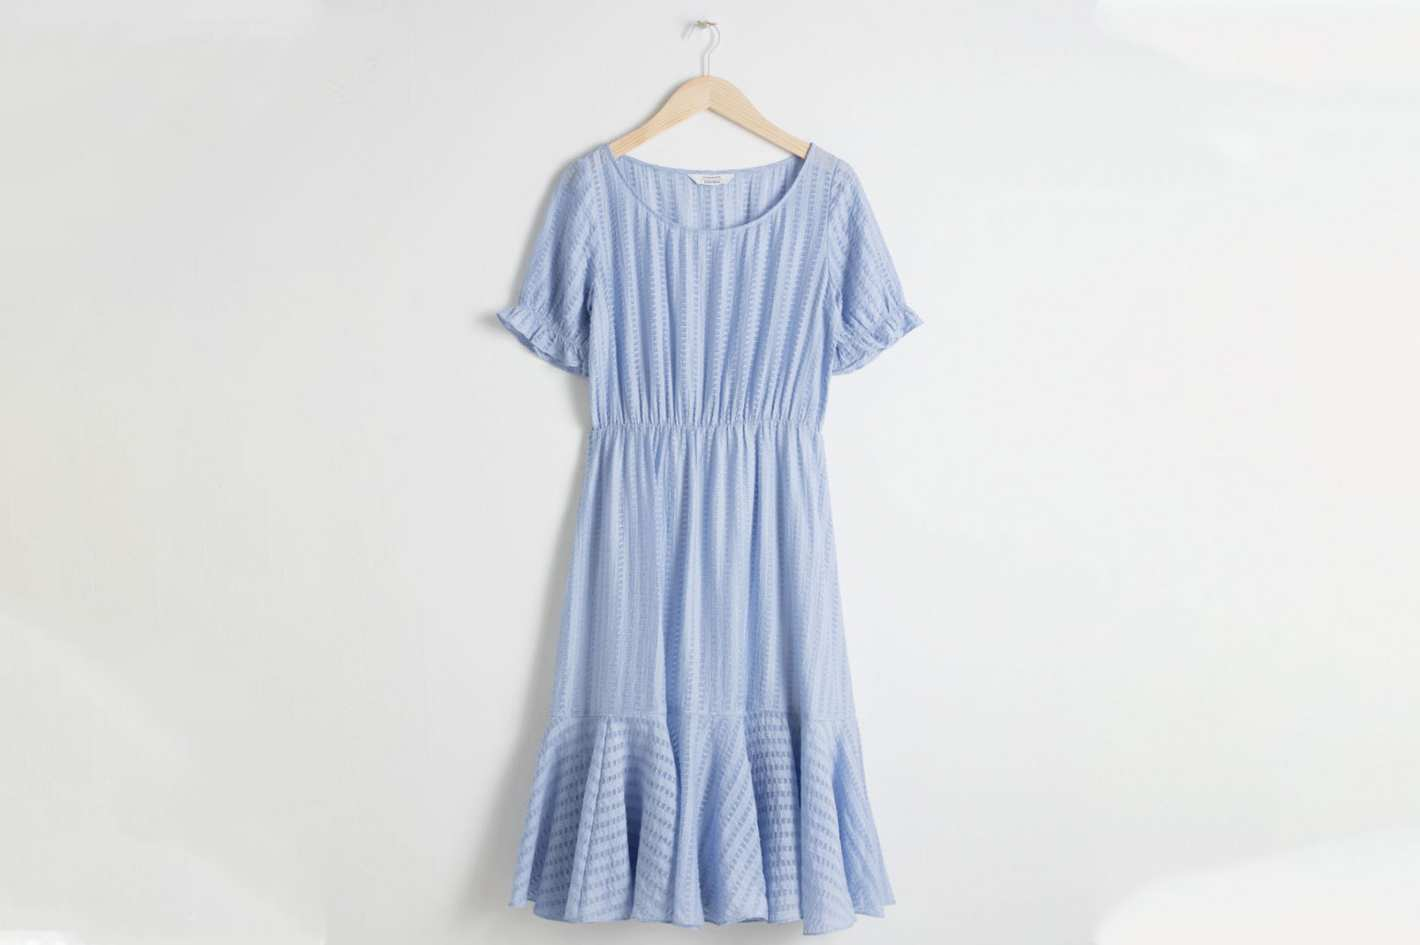 & Other Stories Ribbon Stripe Dress